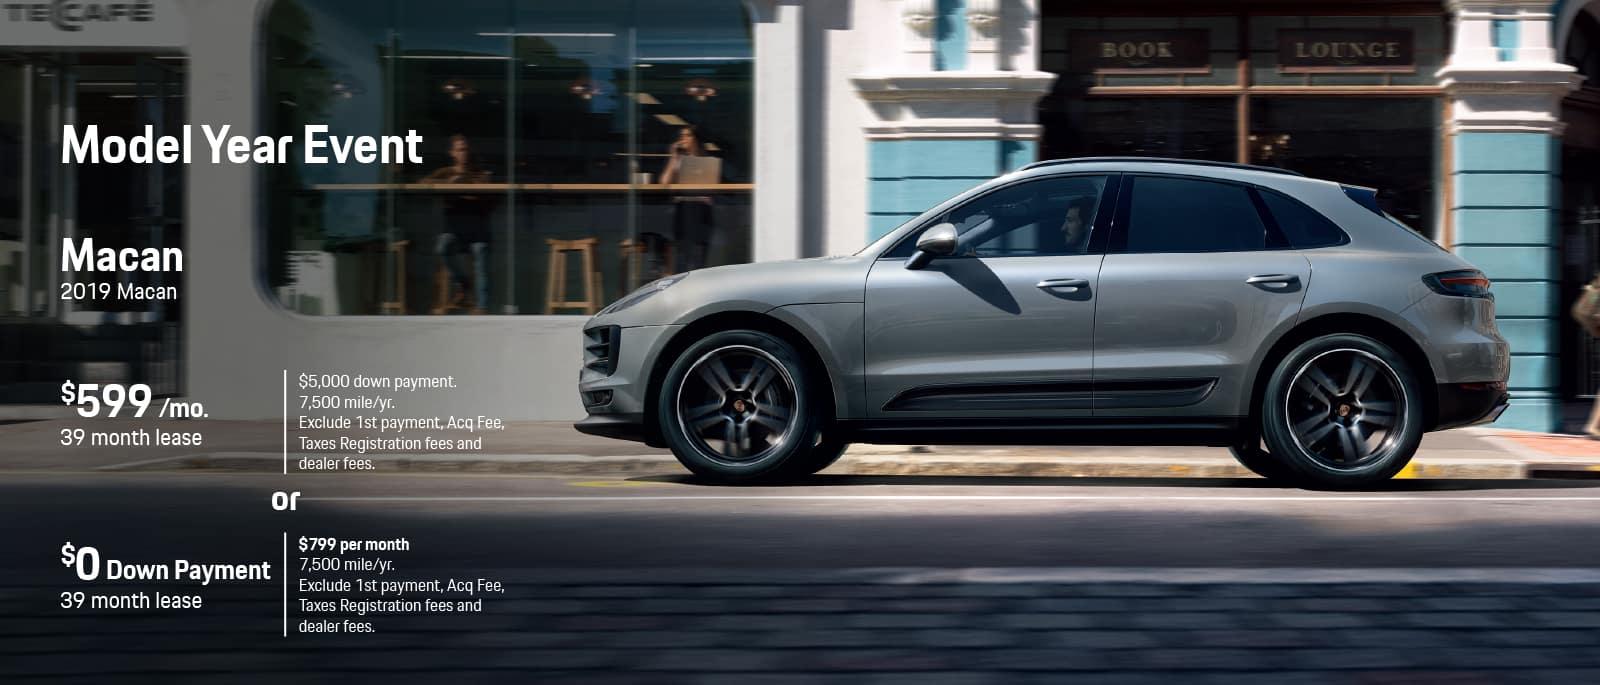 Porsche Macan Model Year End Lease